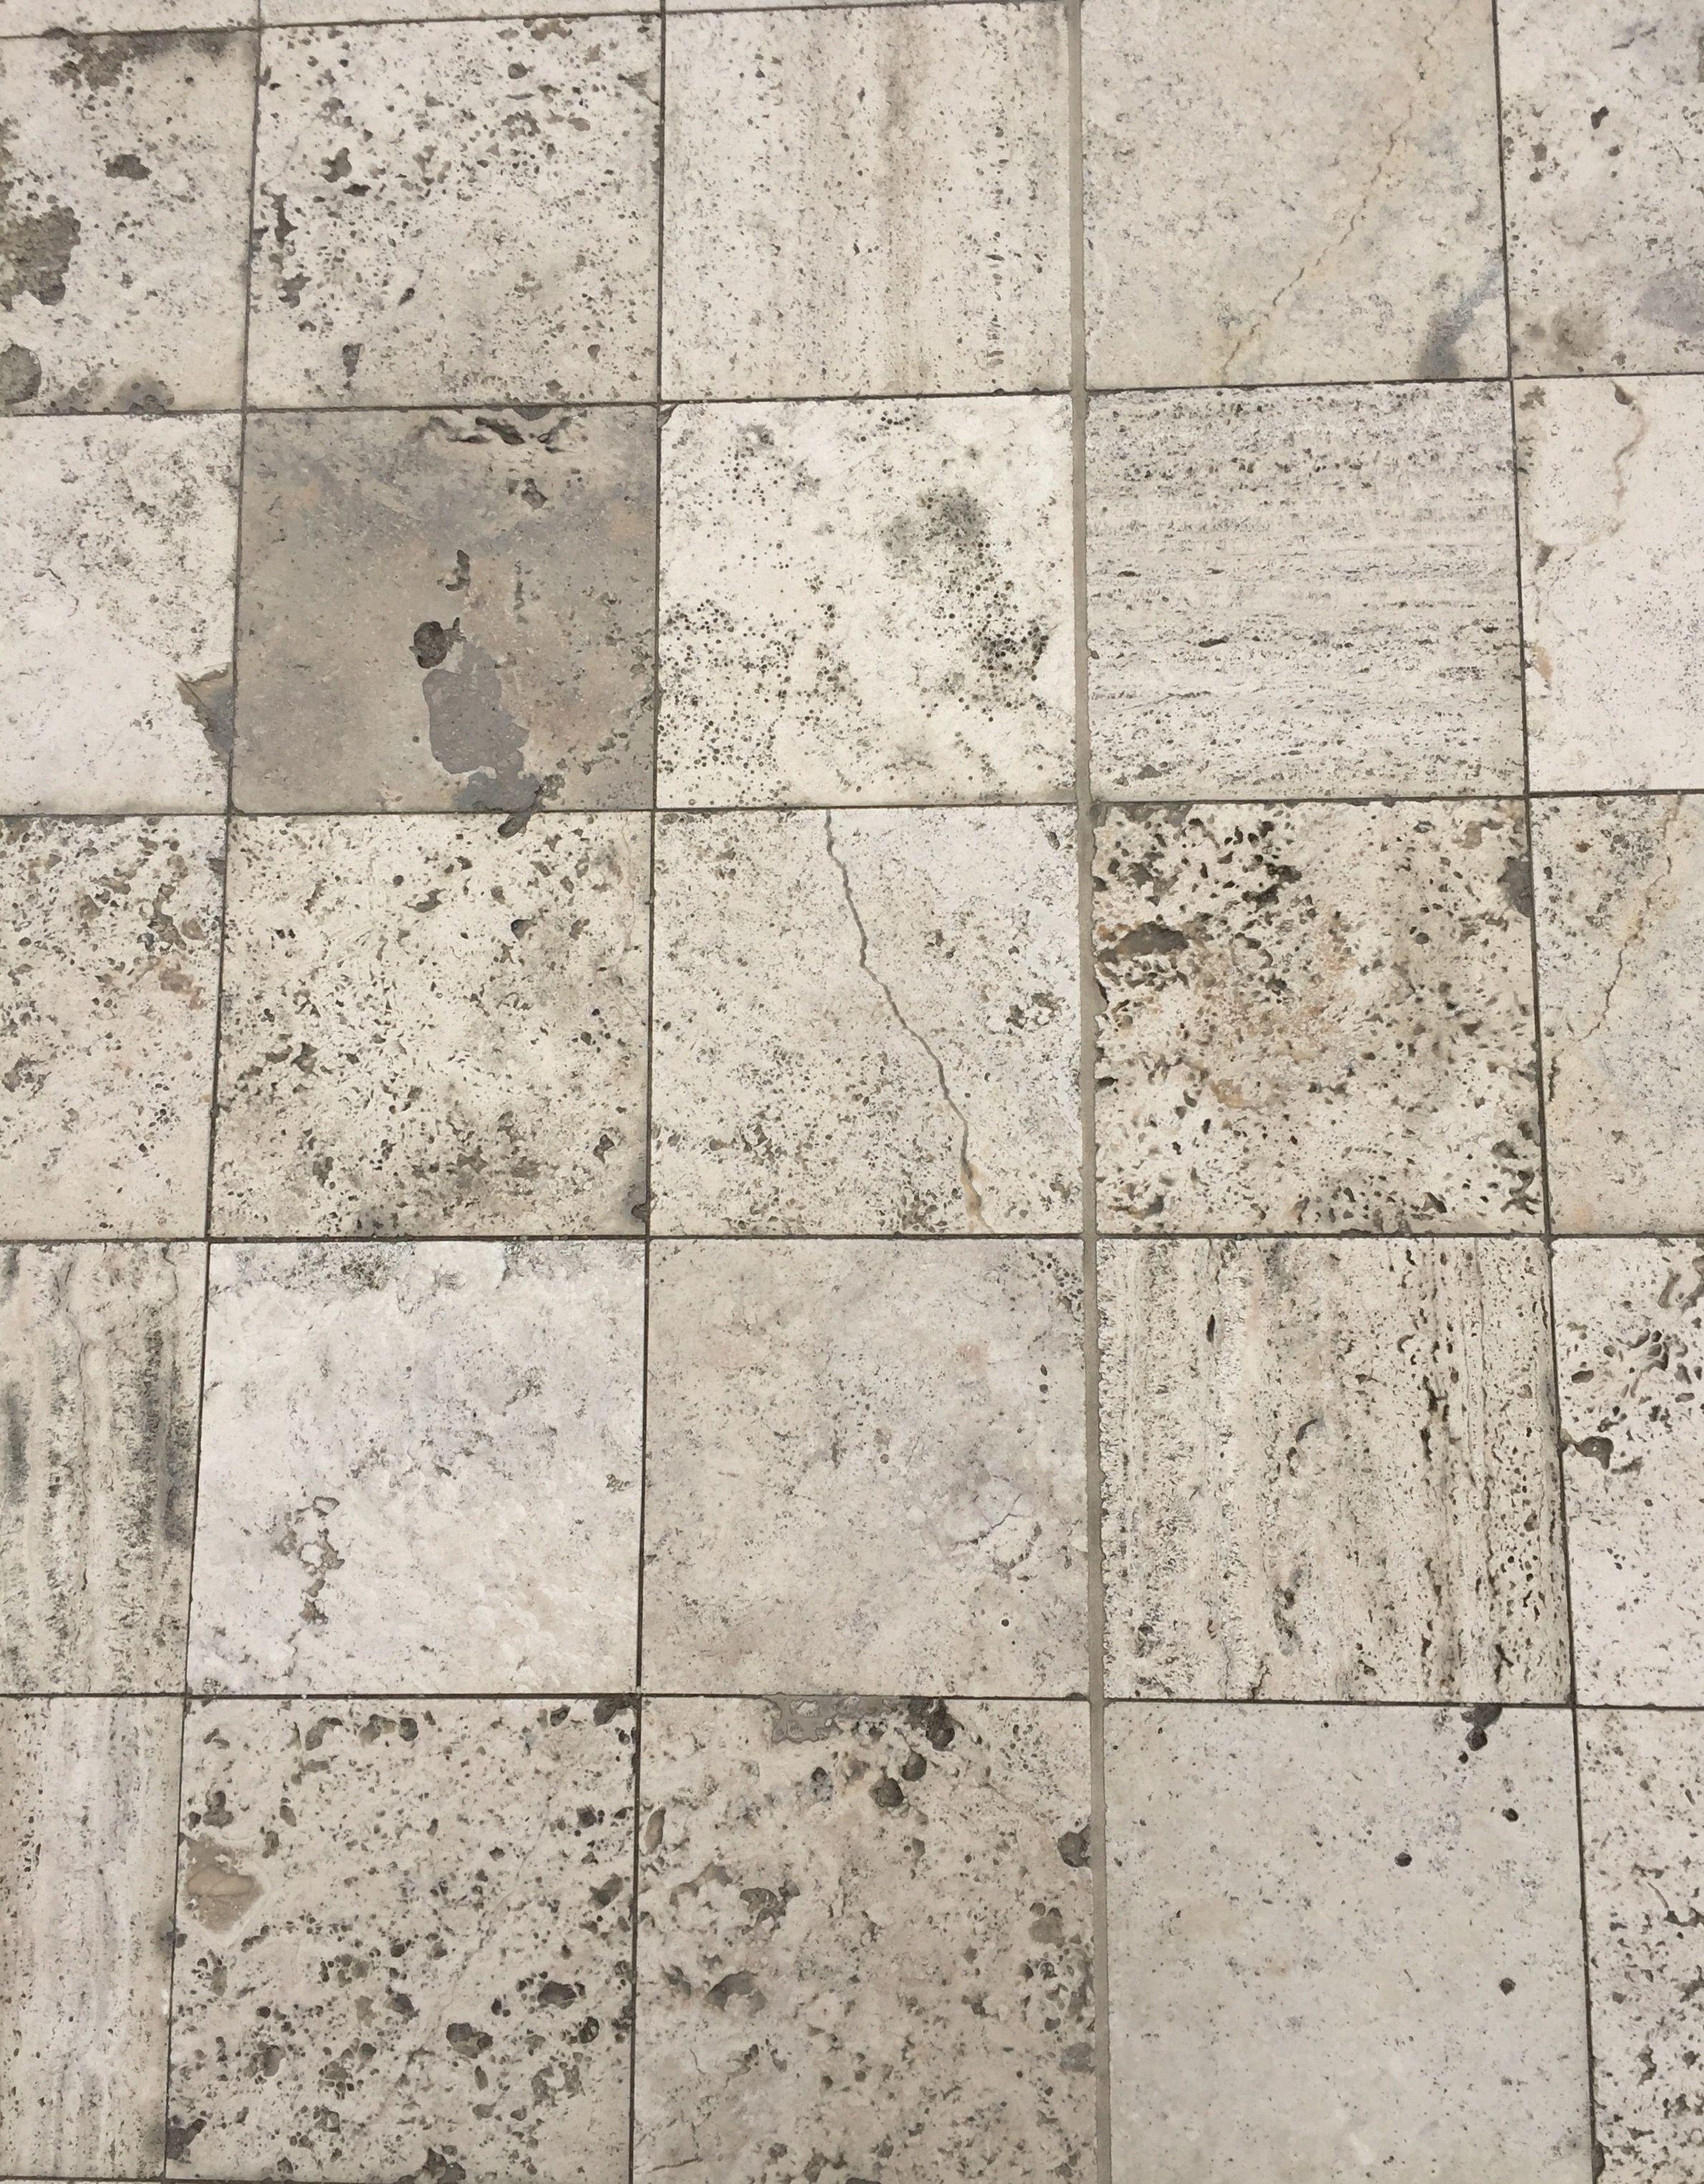 Getty Center, LA Flooring, Tiles, Tile floor